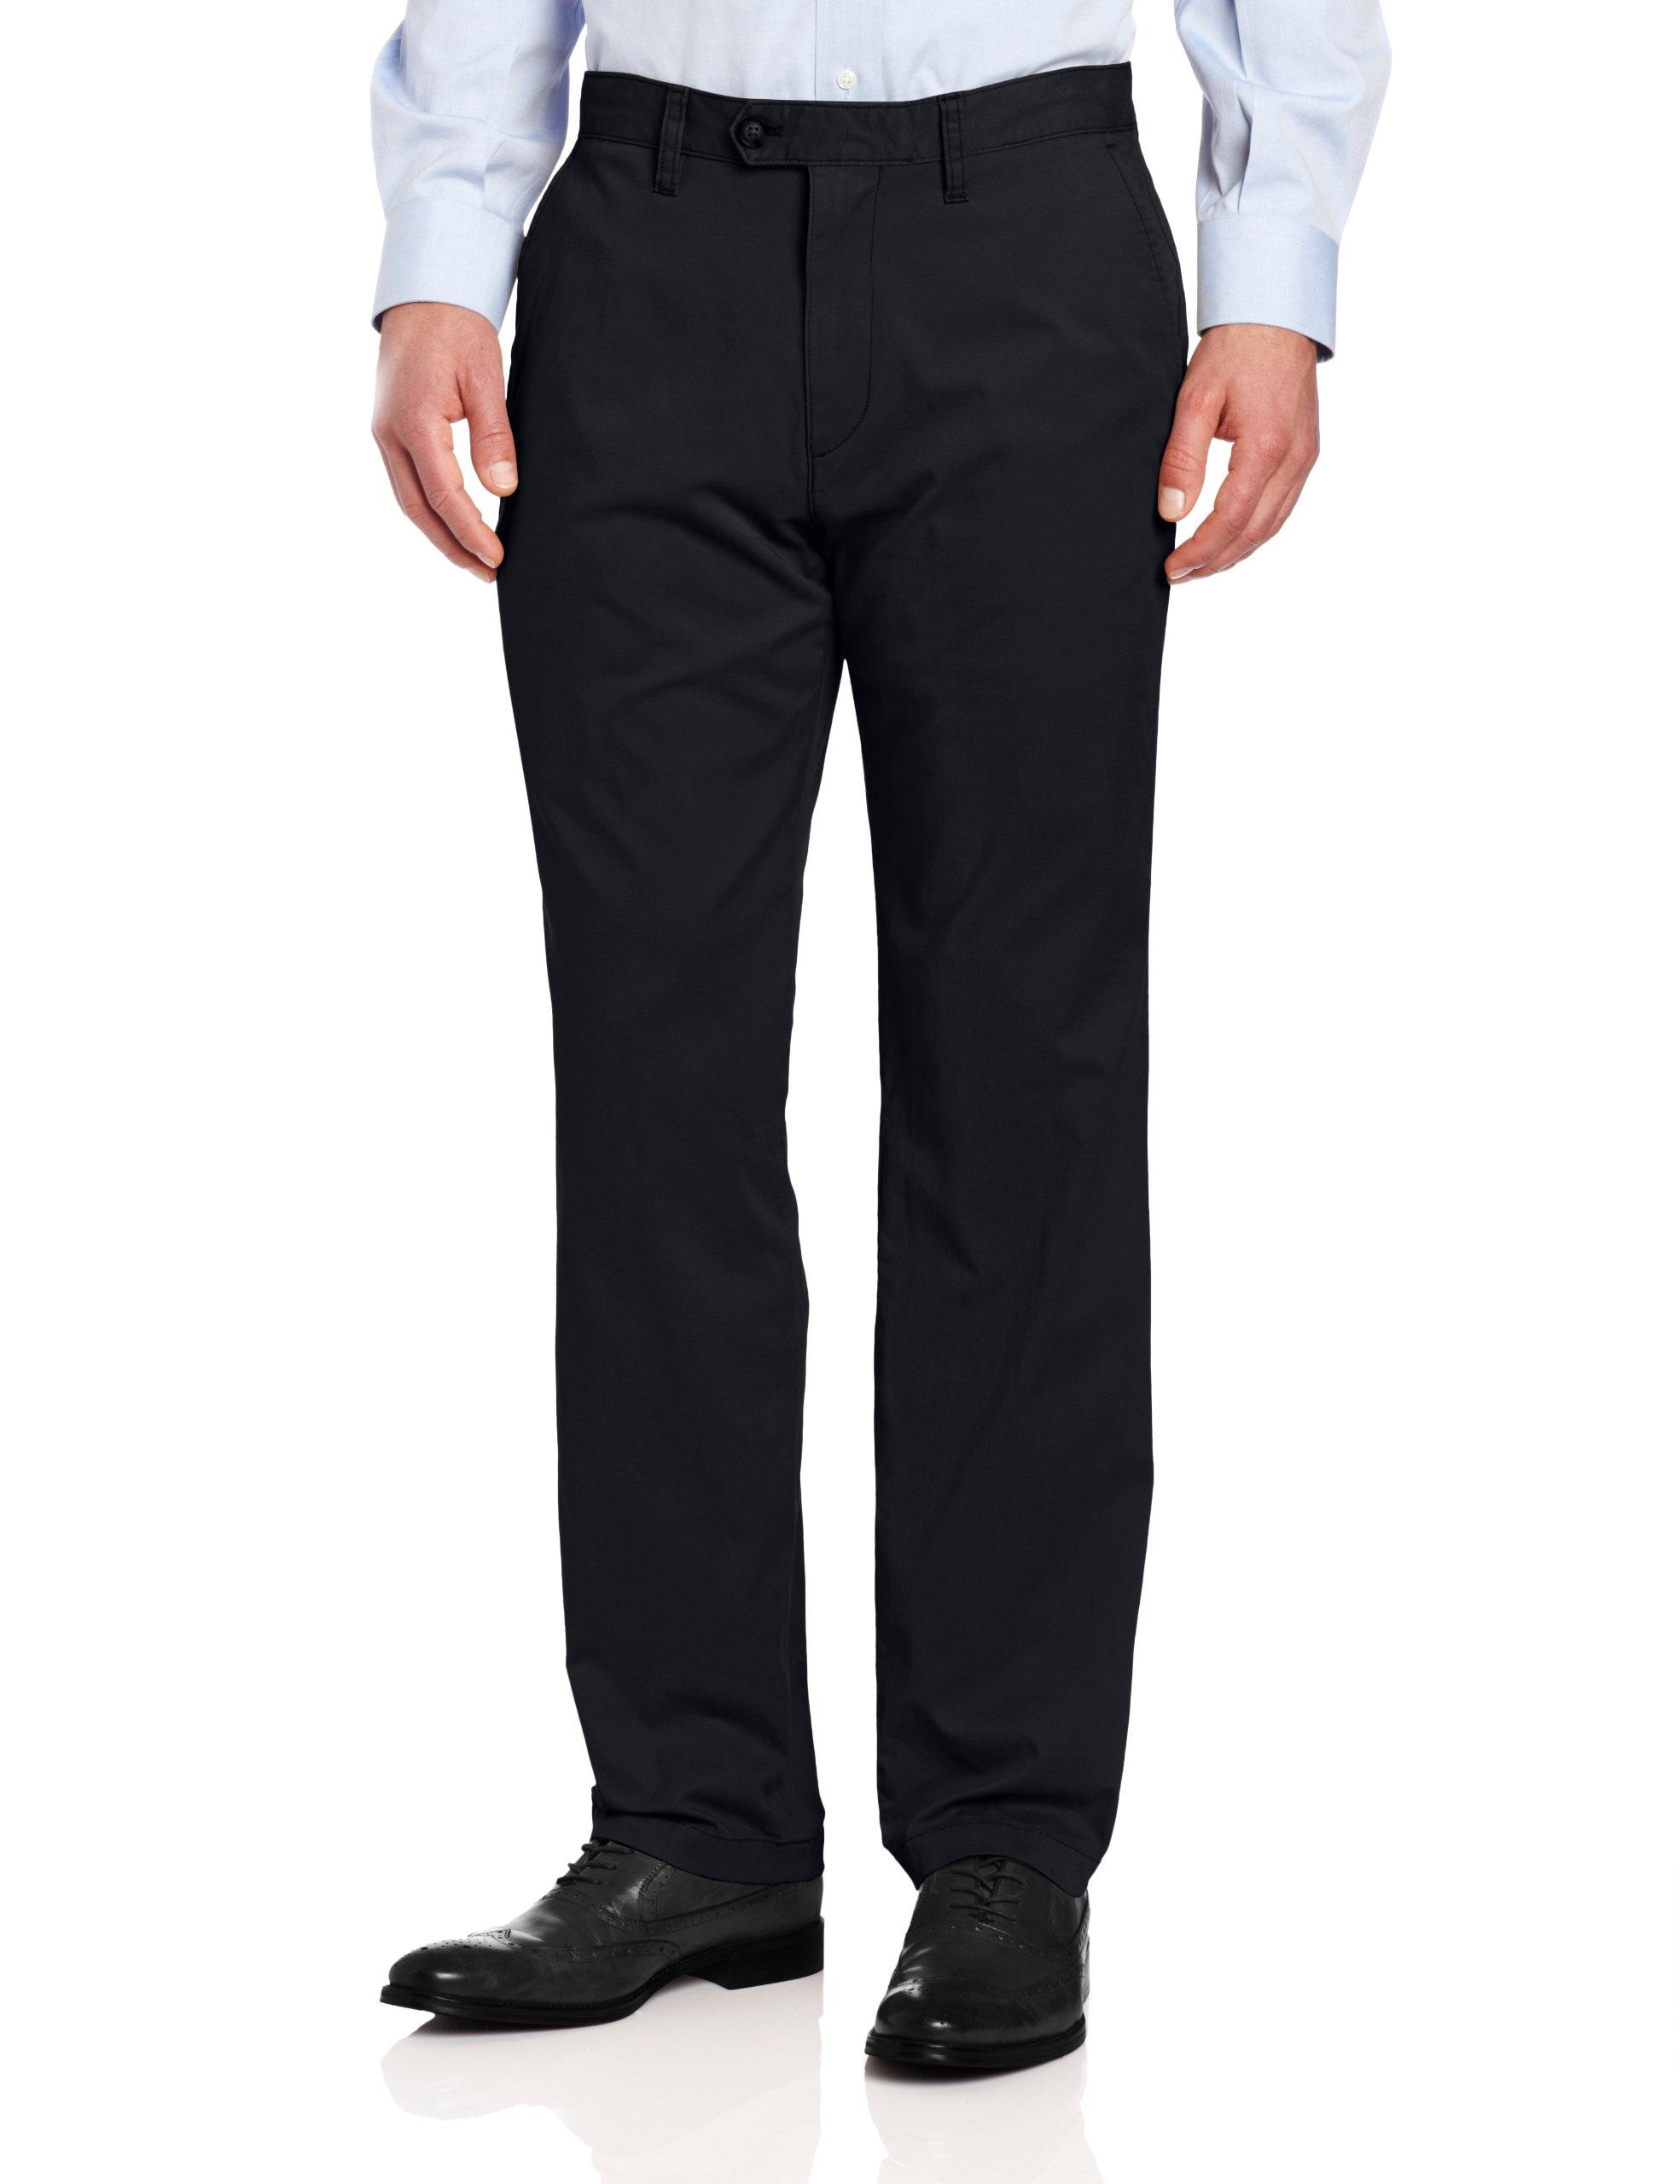 Nautica Men's Beacon Pant, True Navy, 38x30 by Nautica